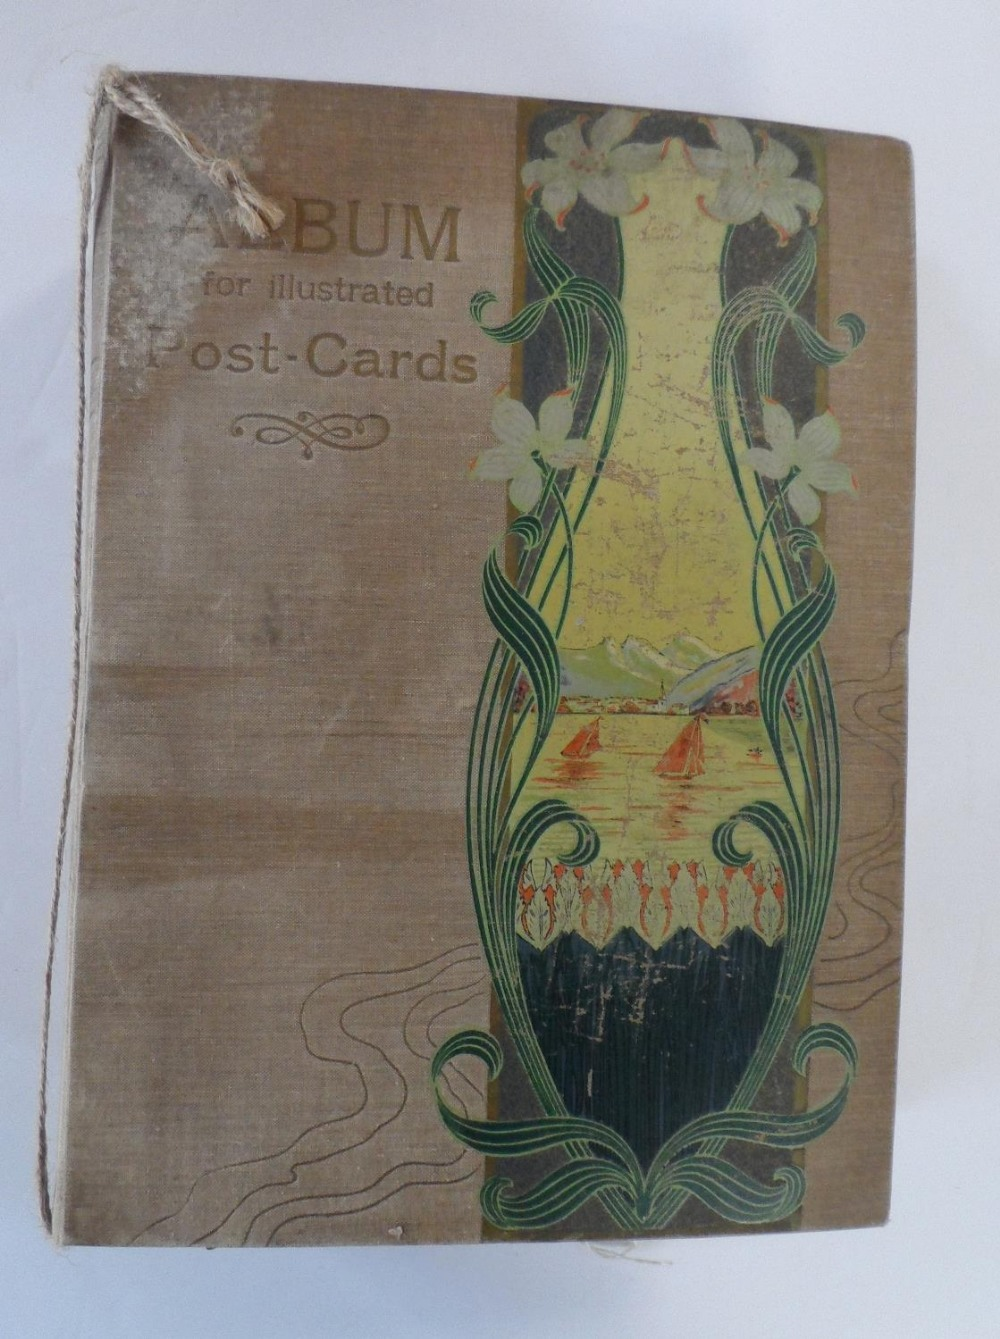 Superb 1920/30s album of mainly Belgium landscapes (Ostend, Bruges, Waterloo, Antwerp etc) & a few